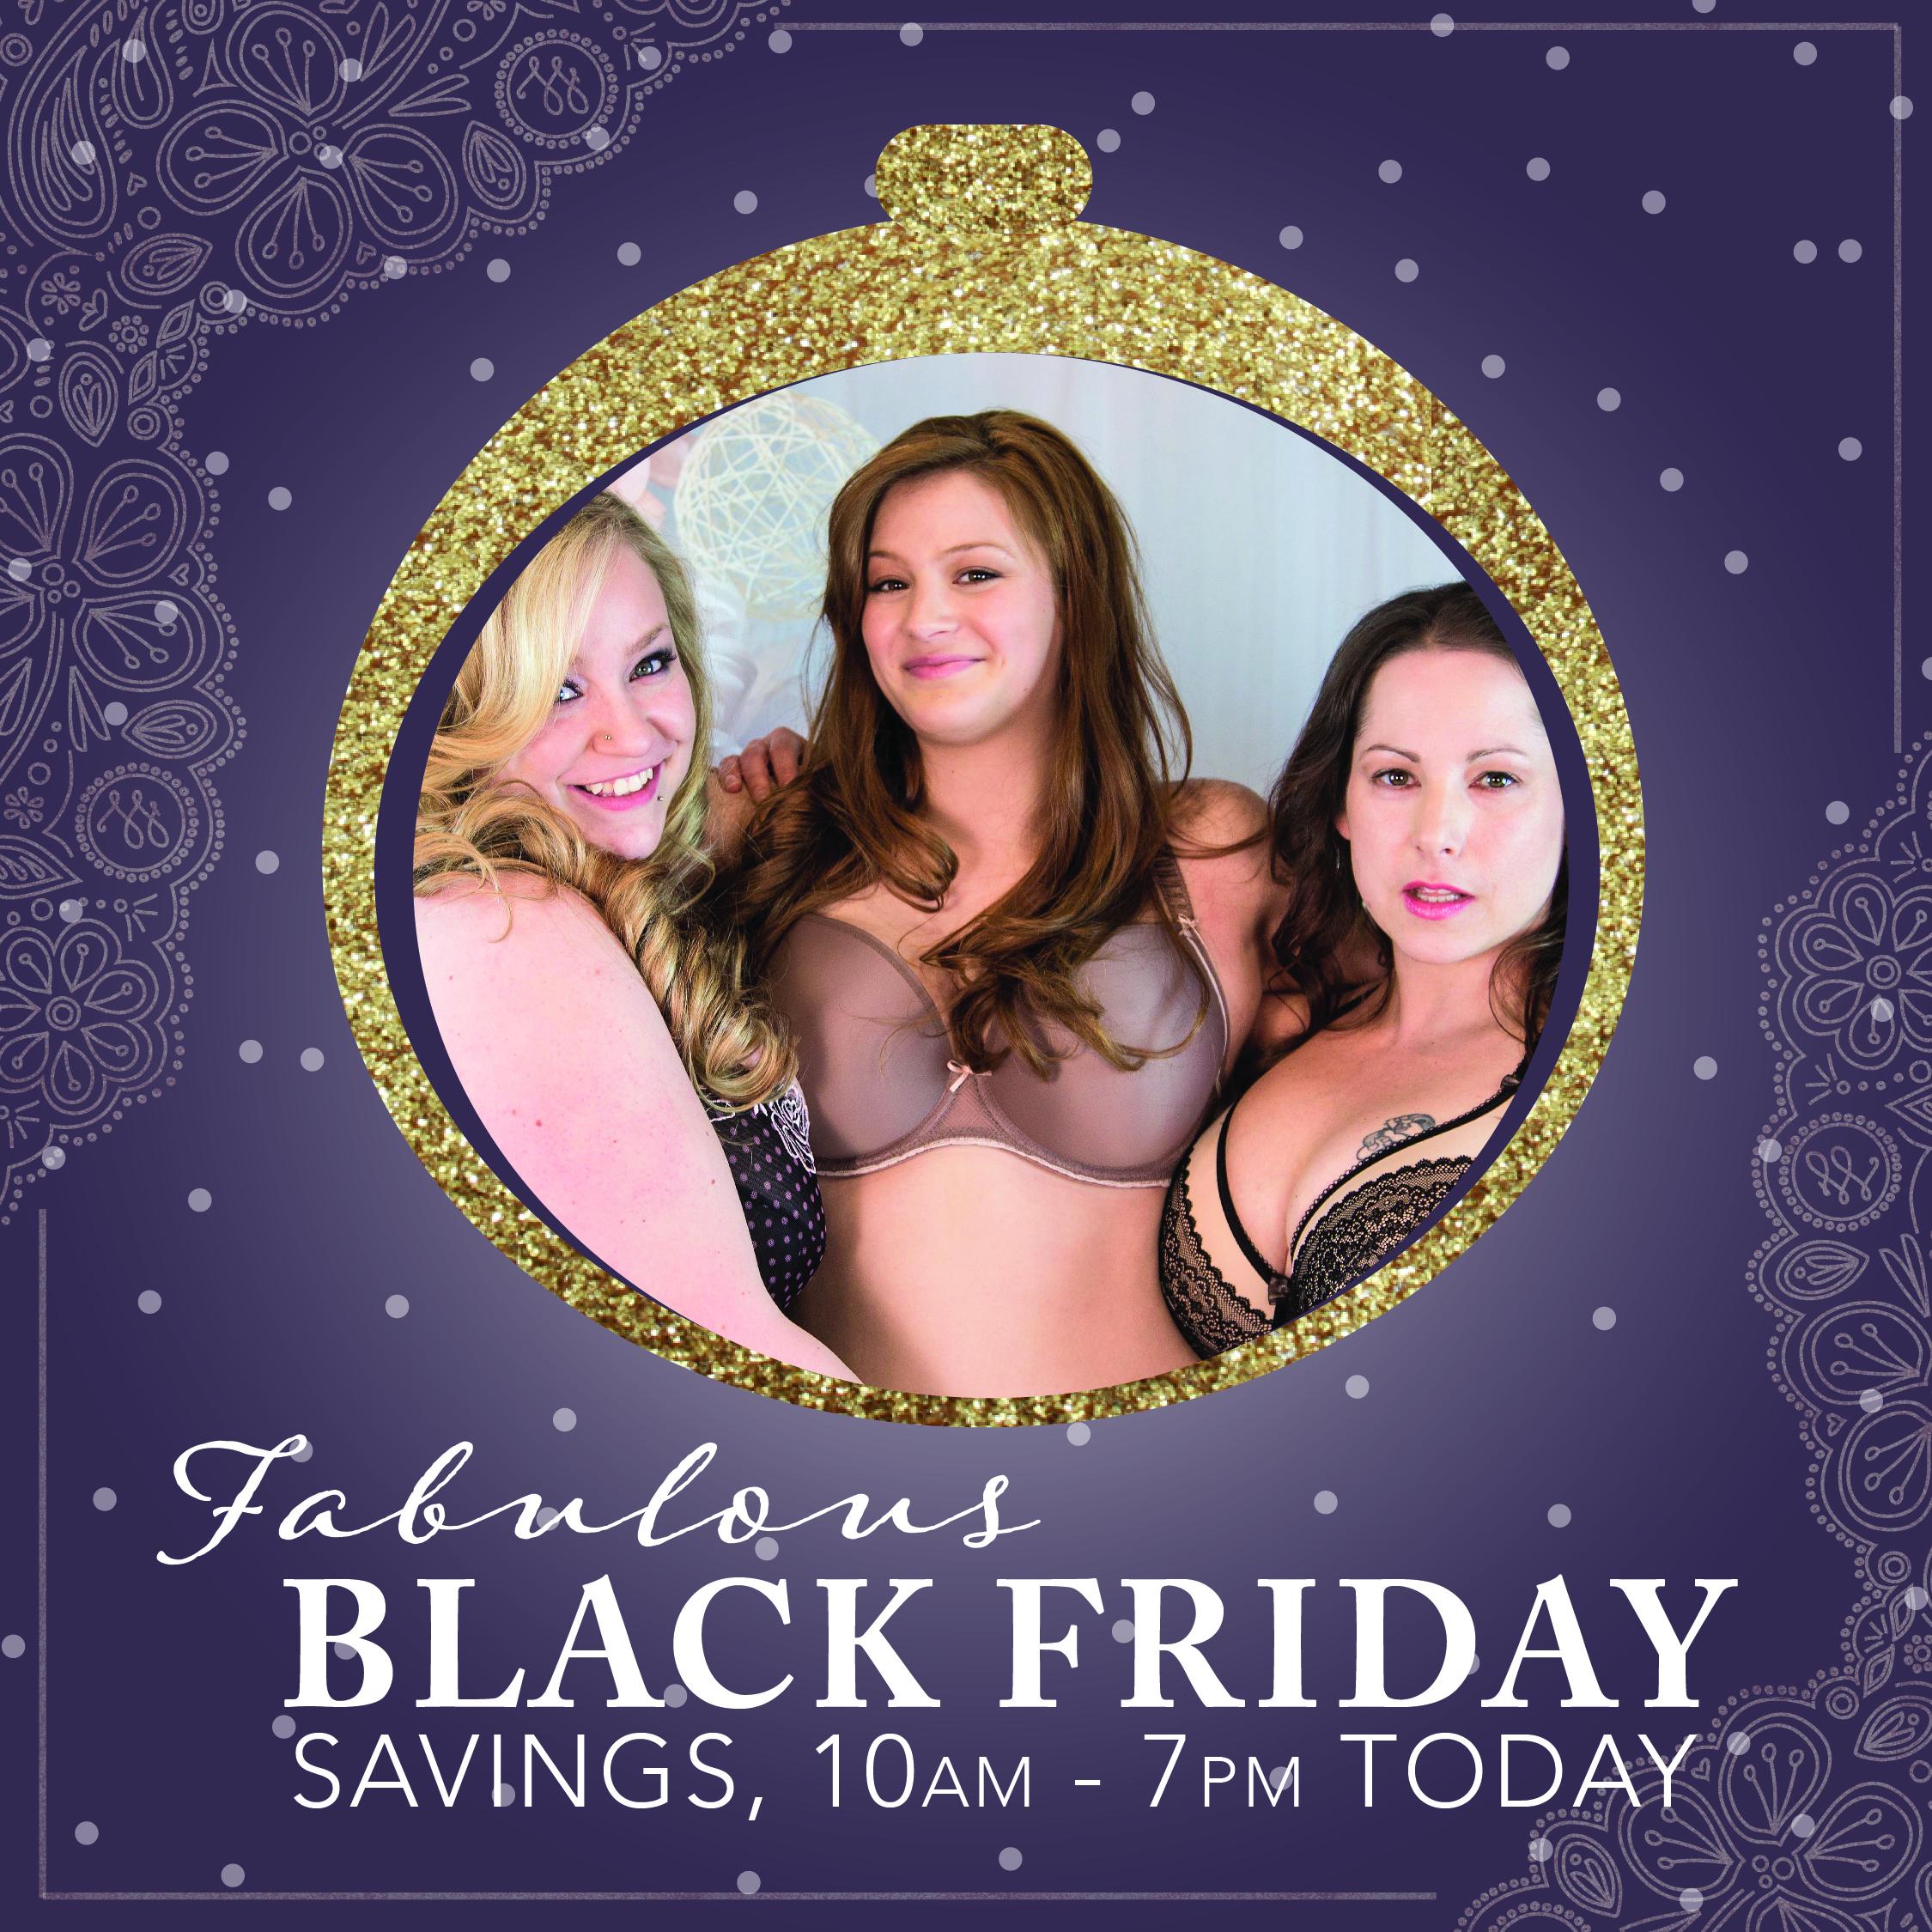 Black Friday Savings-01.jpg